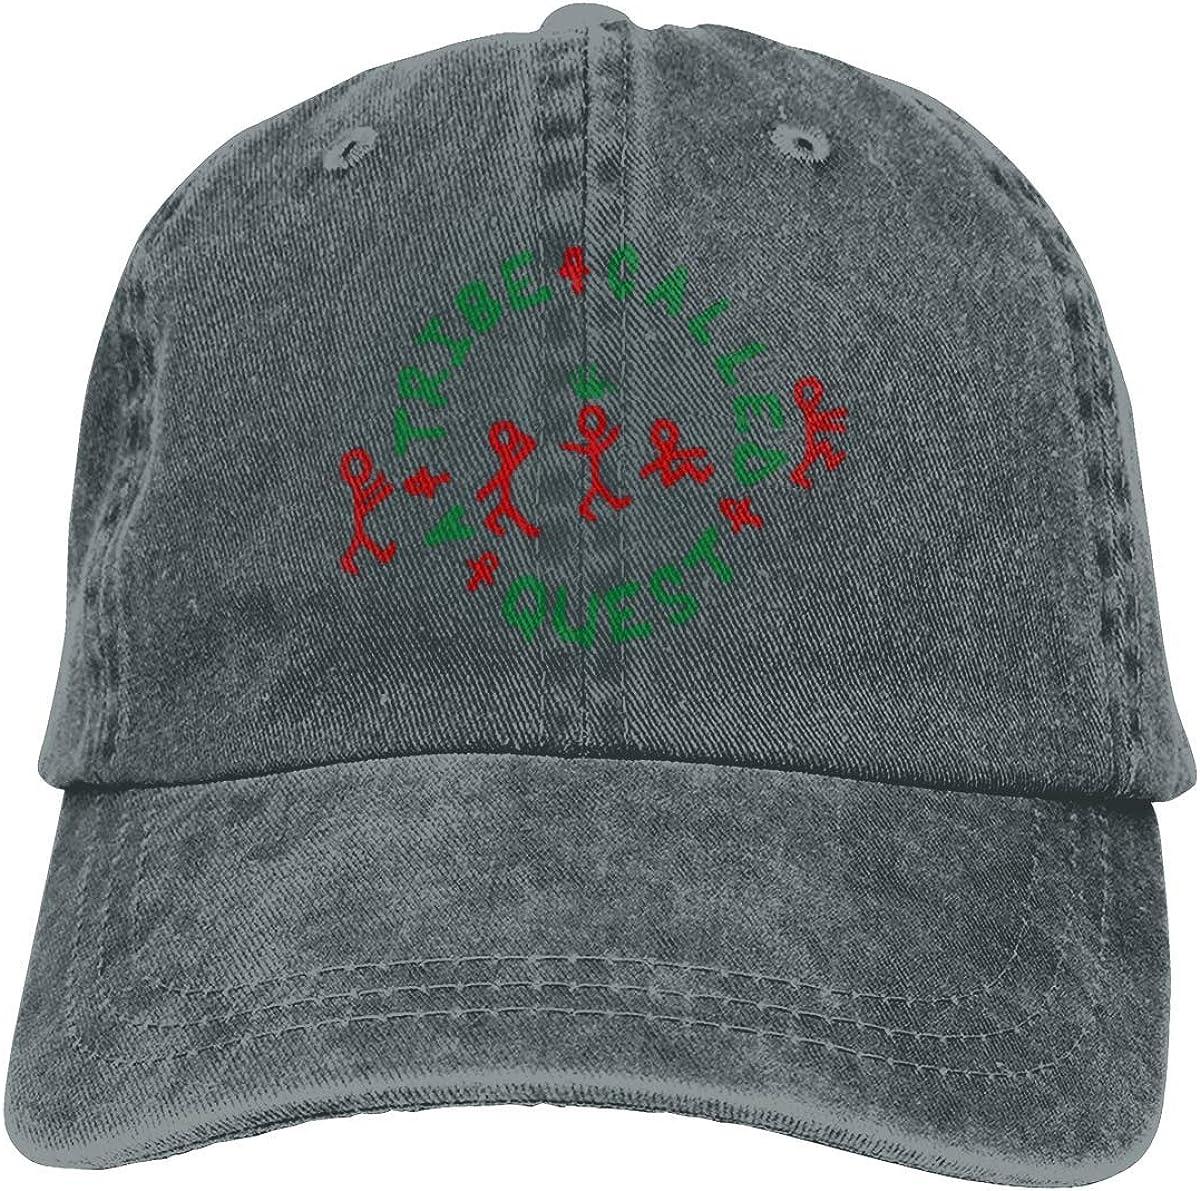 Tribe Called Quest Logo Sports Denim Cap Adjustable Snapback Casquettes Unisex Plain Baseball Cowboy Hat Black